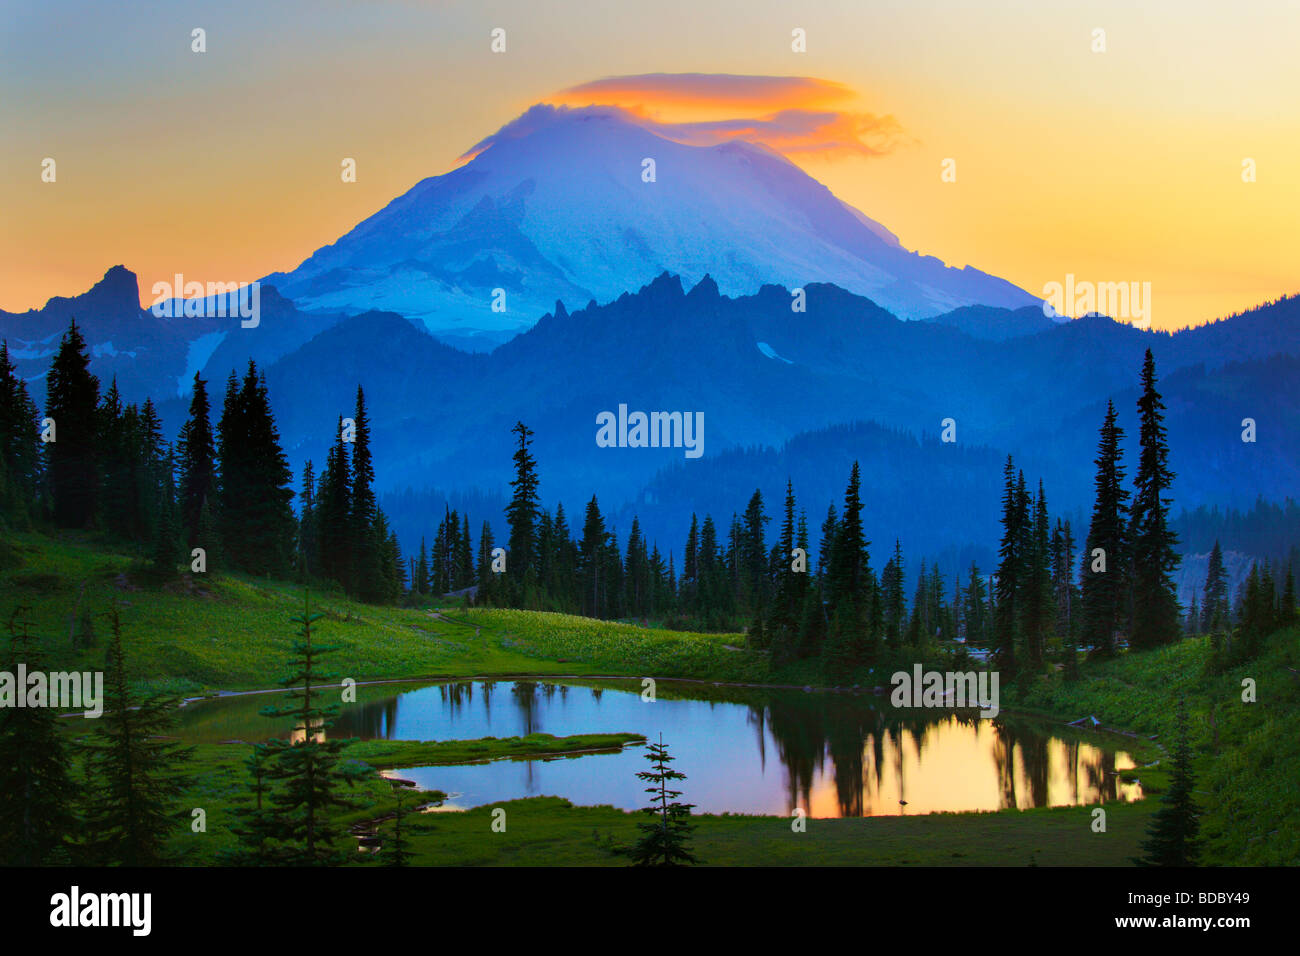 Mount Rainier at sunset from Tipsoo Lake Stock Photo